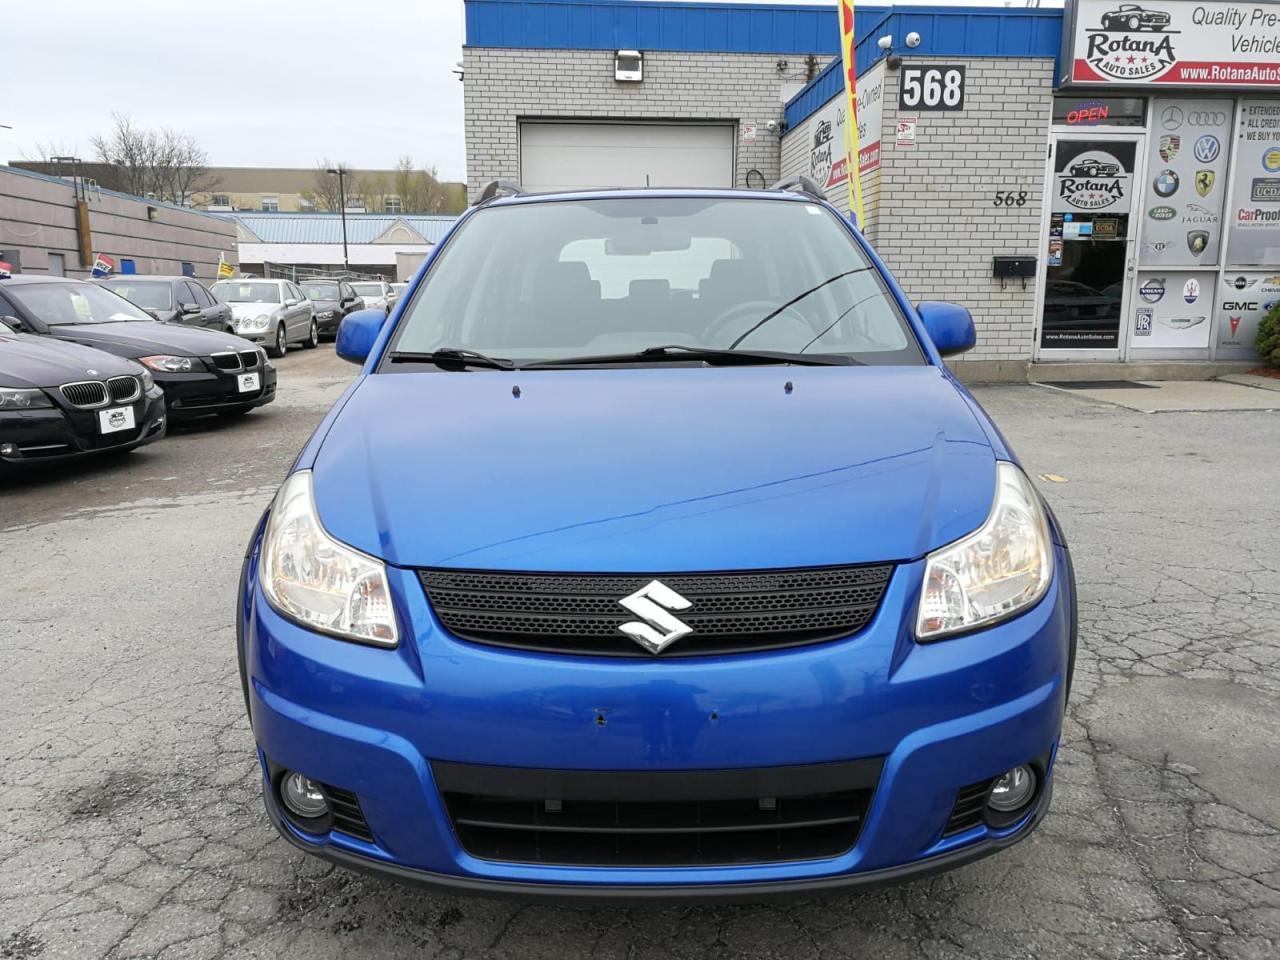 2007 Suzuki SX4 | Rotana Auto Sales